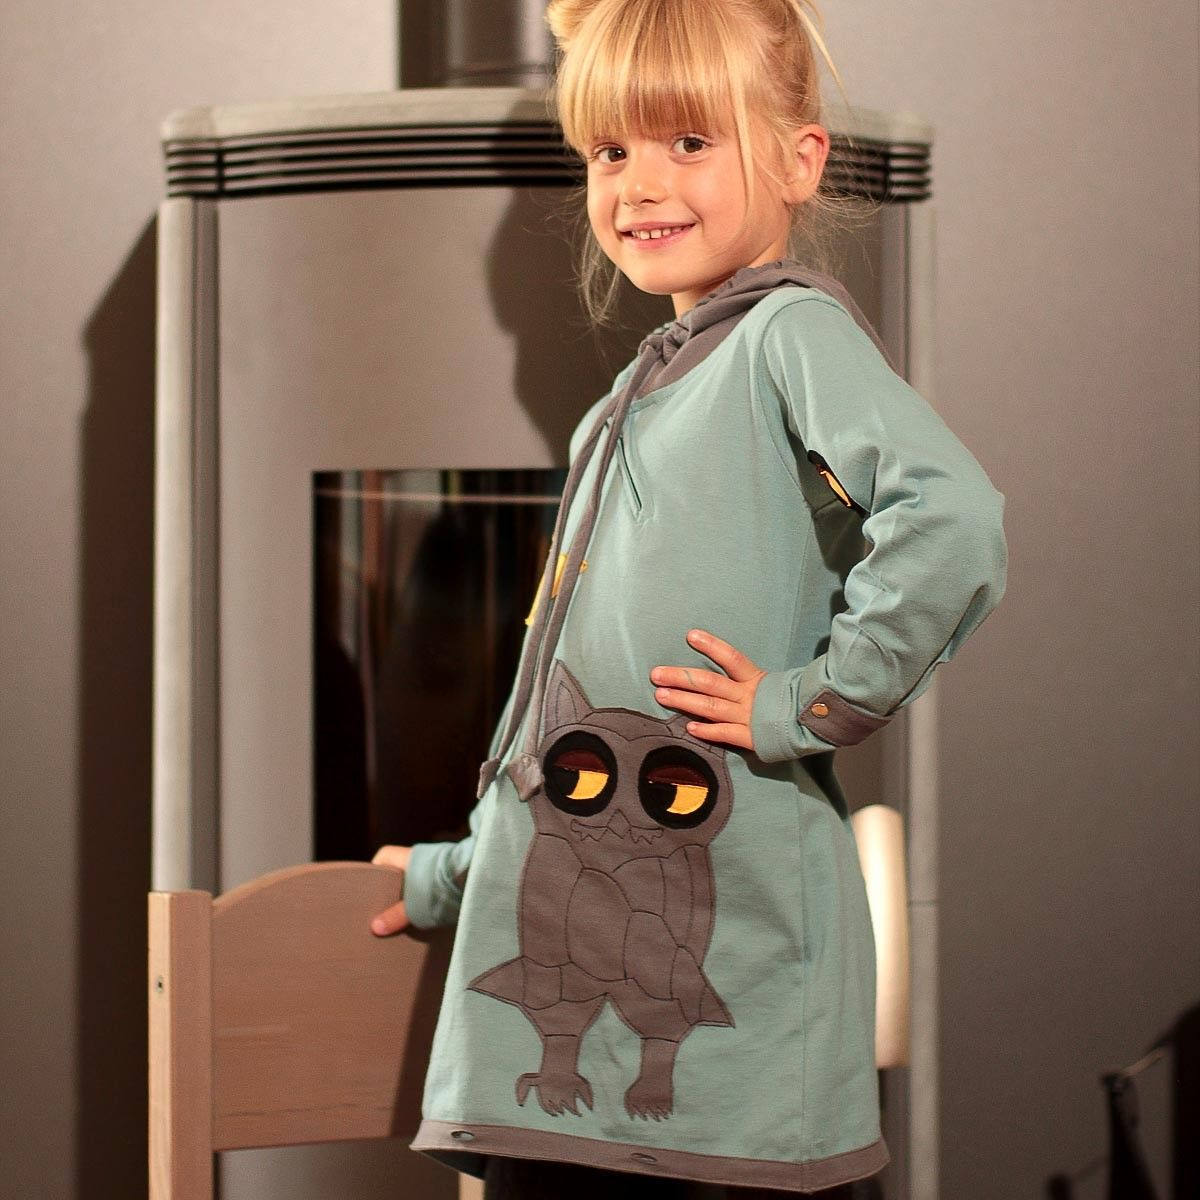 Robe originale pour petite fille